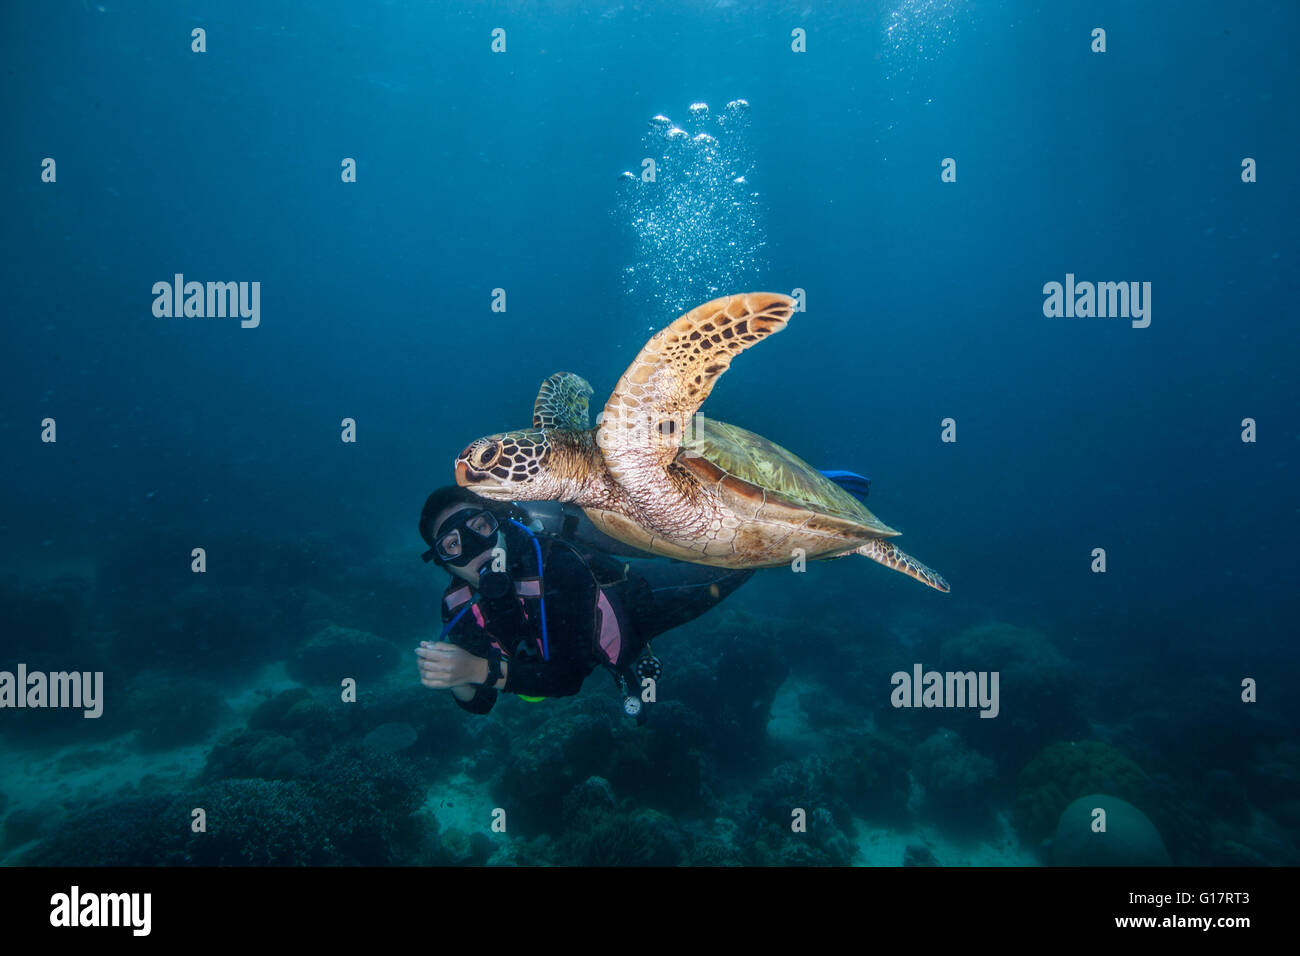 Mujer joven natación con rara tortuga verde (Chelonia mydas), Cebú, Filipinas Imagen De Stock